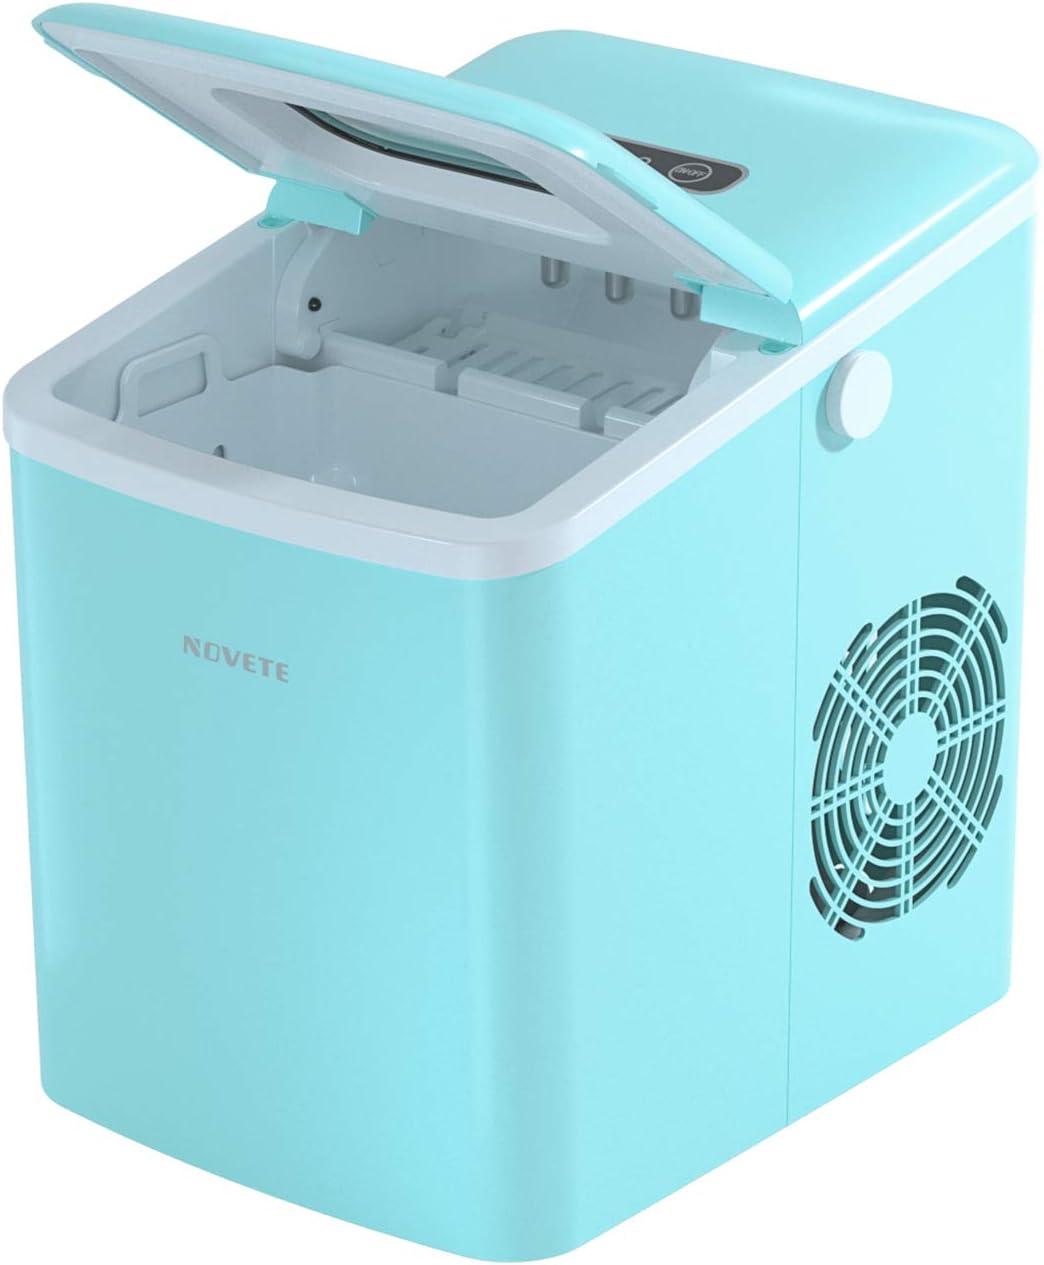 NOVETE Portable Ice Maker